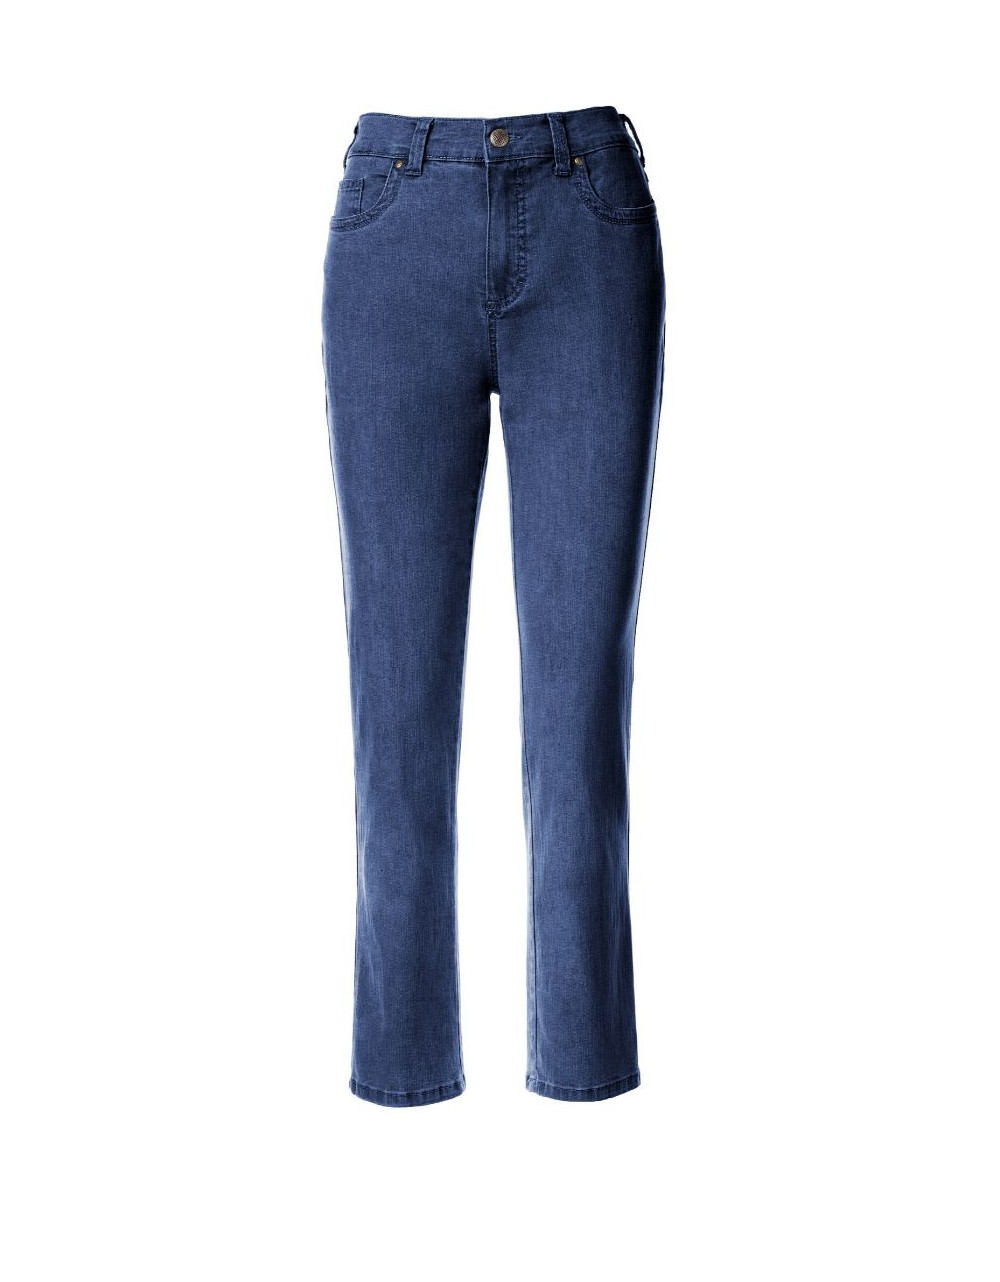 Anna Montana Dora London Jeans Stonewash|Dora Jeans|Irish Handcrafts 2